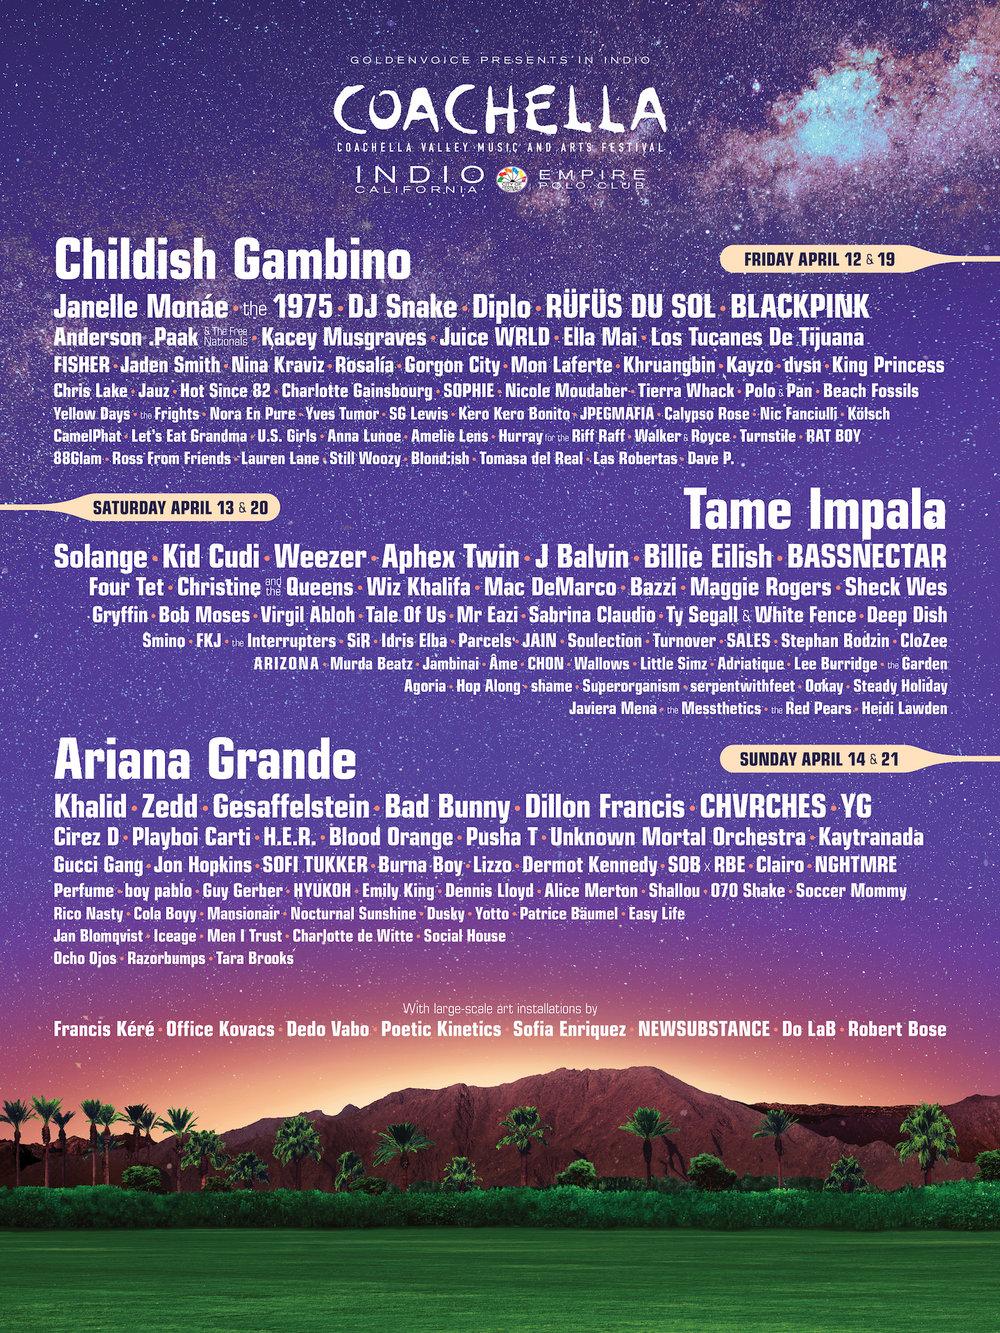 CATCH US AT… - Coachella weekend 1!